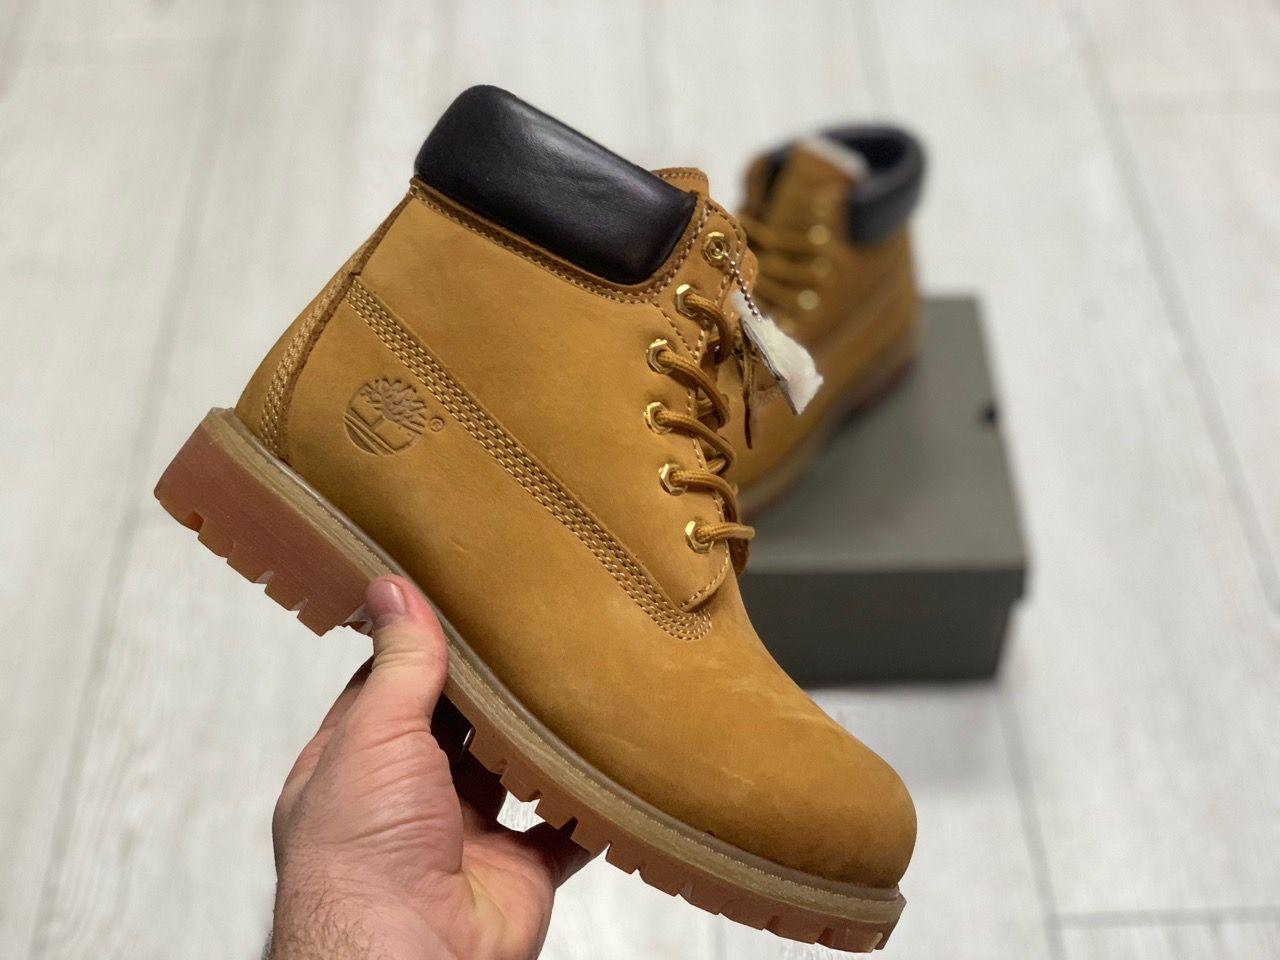 Ботинки на меху Timberland 6 Inch Premium Waterproof Boots песочные